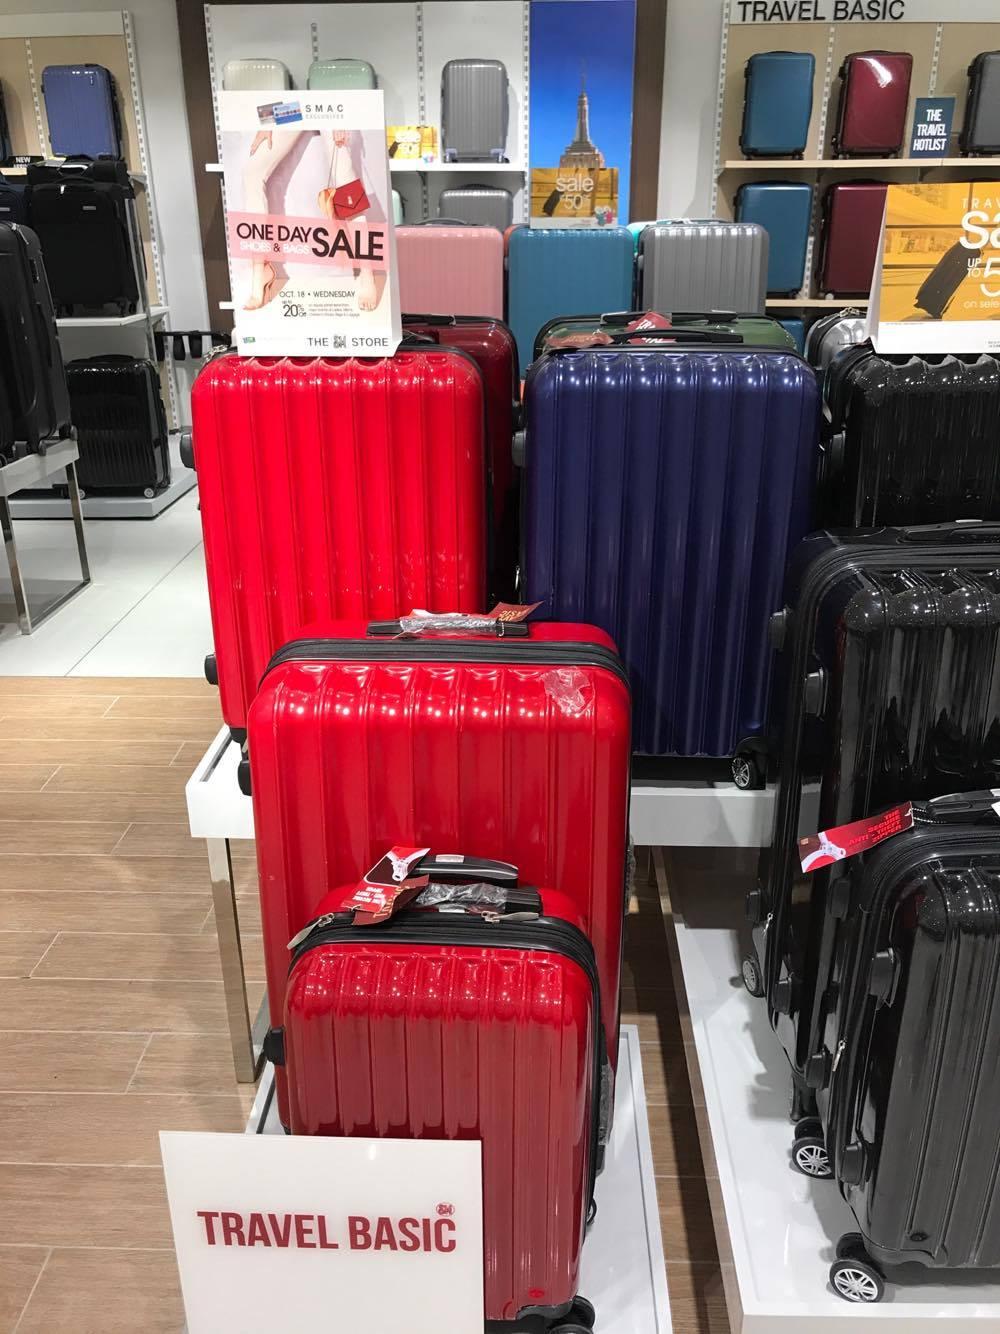 sm advantage exclusive the sm store shoes and bag sale